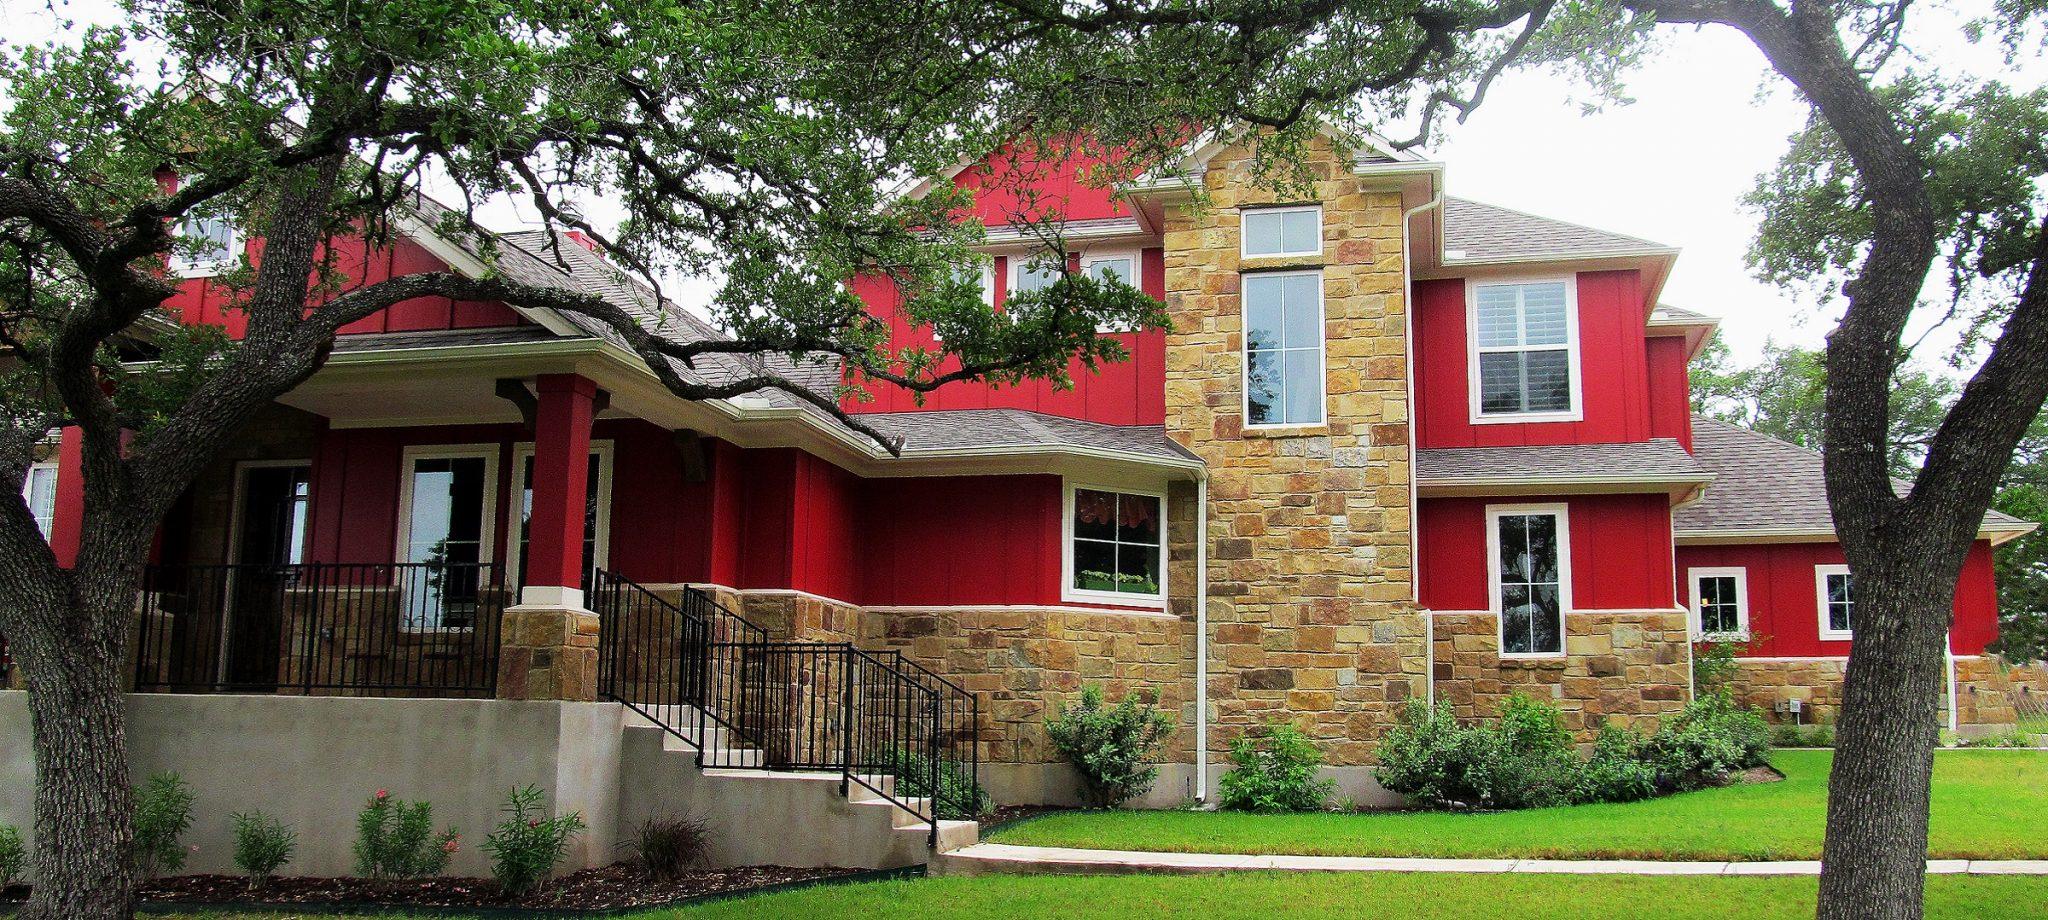 Custom home builders glazier homes georgetown liberty for Liberty hill custom home builders